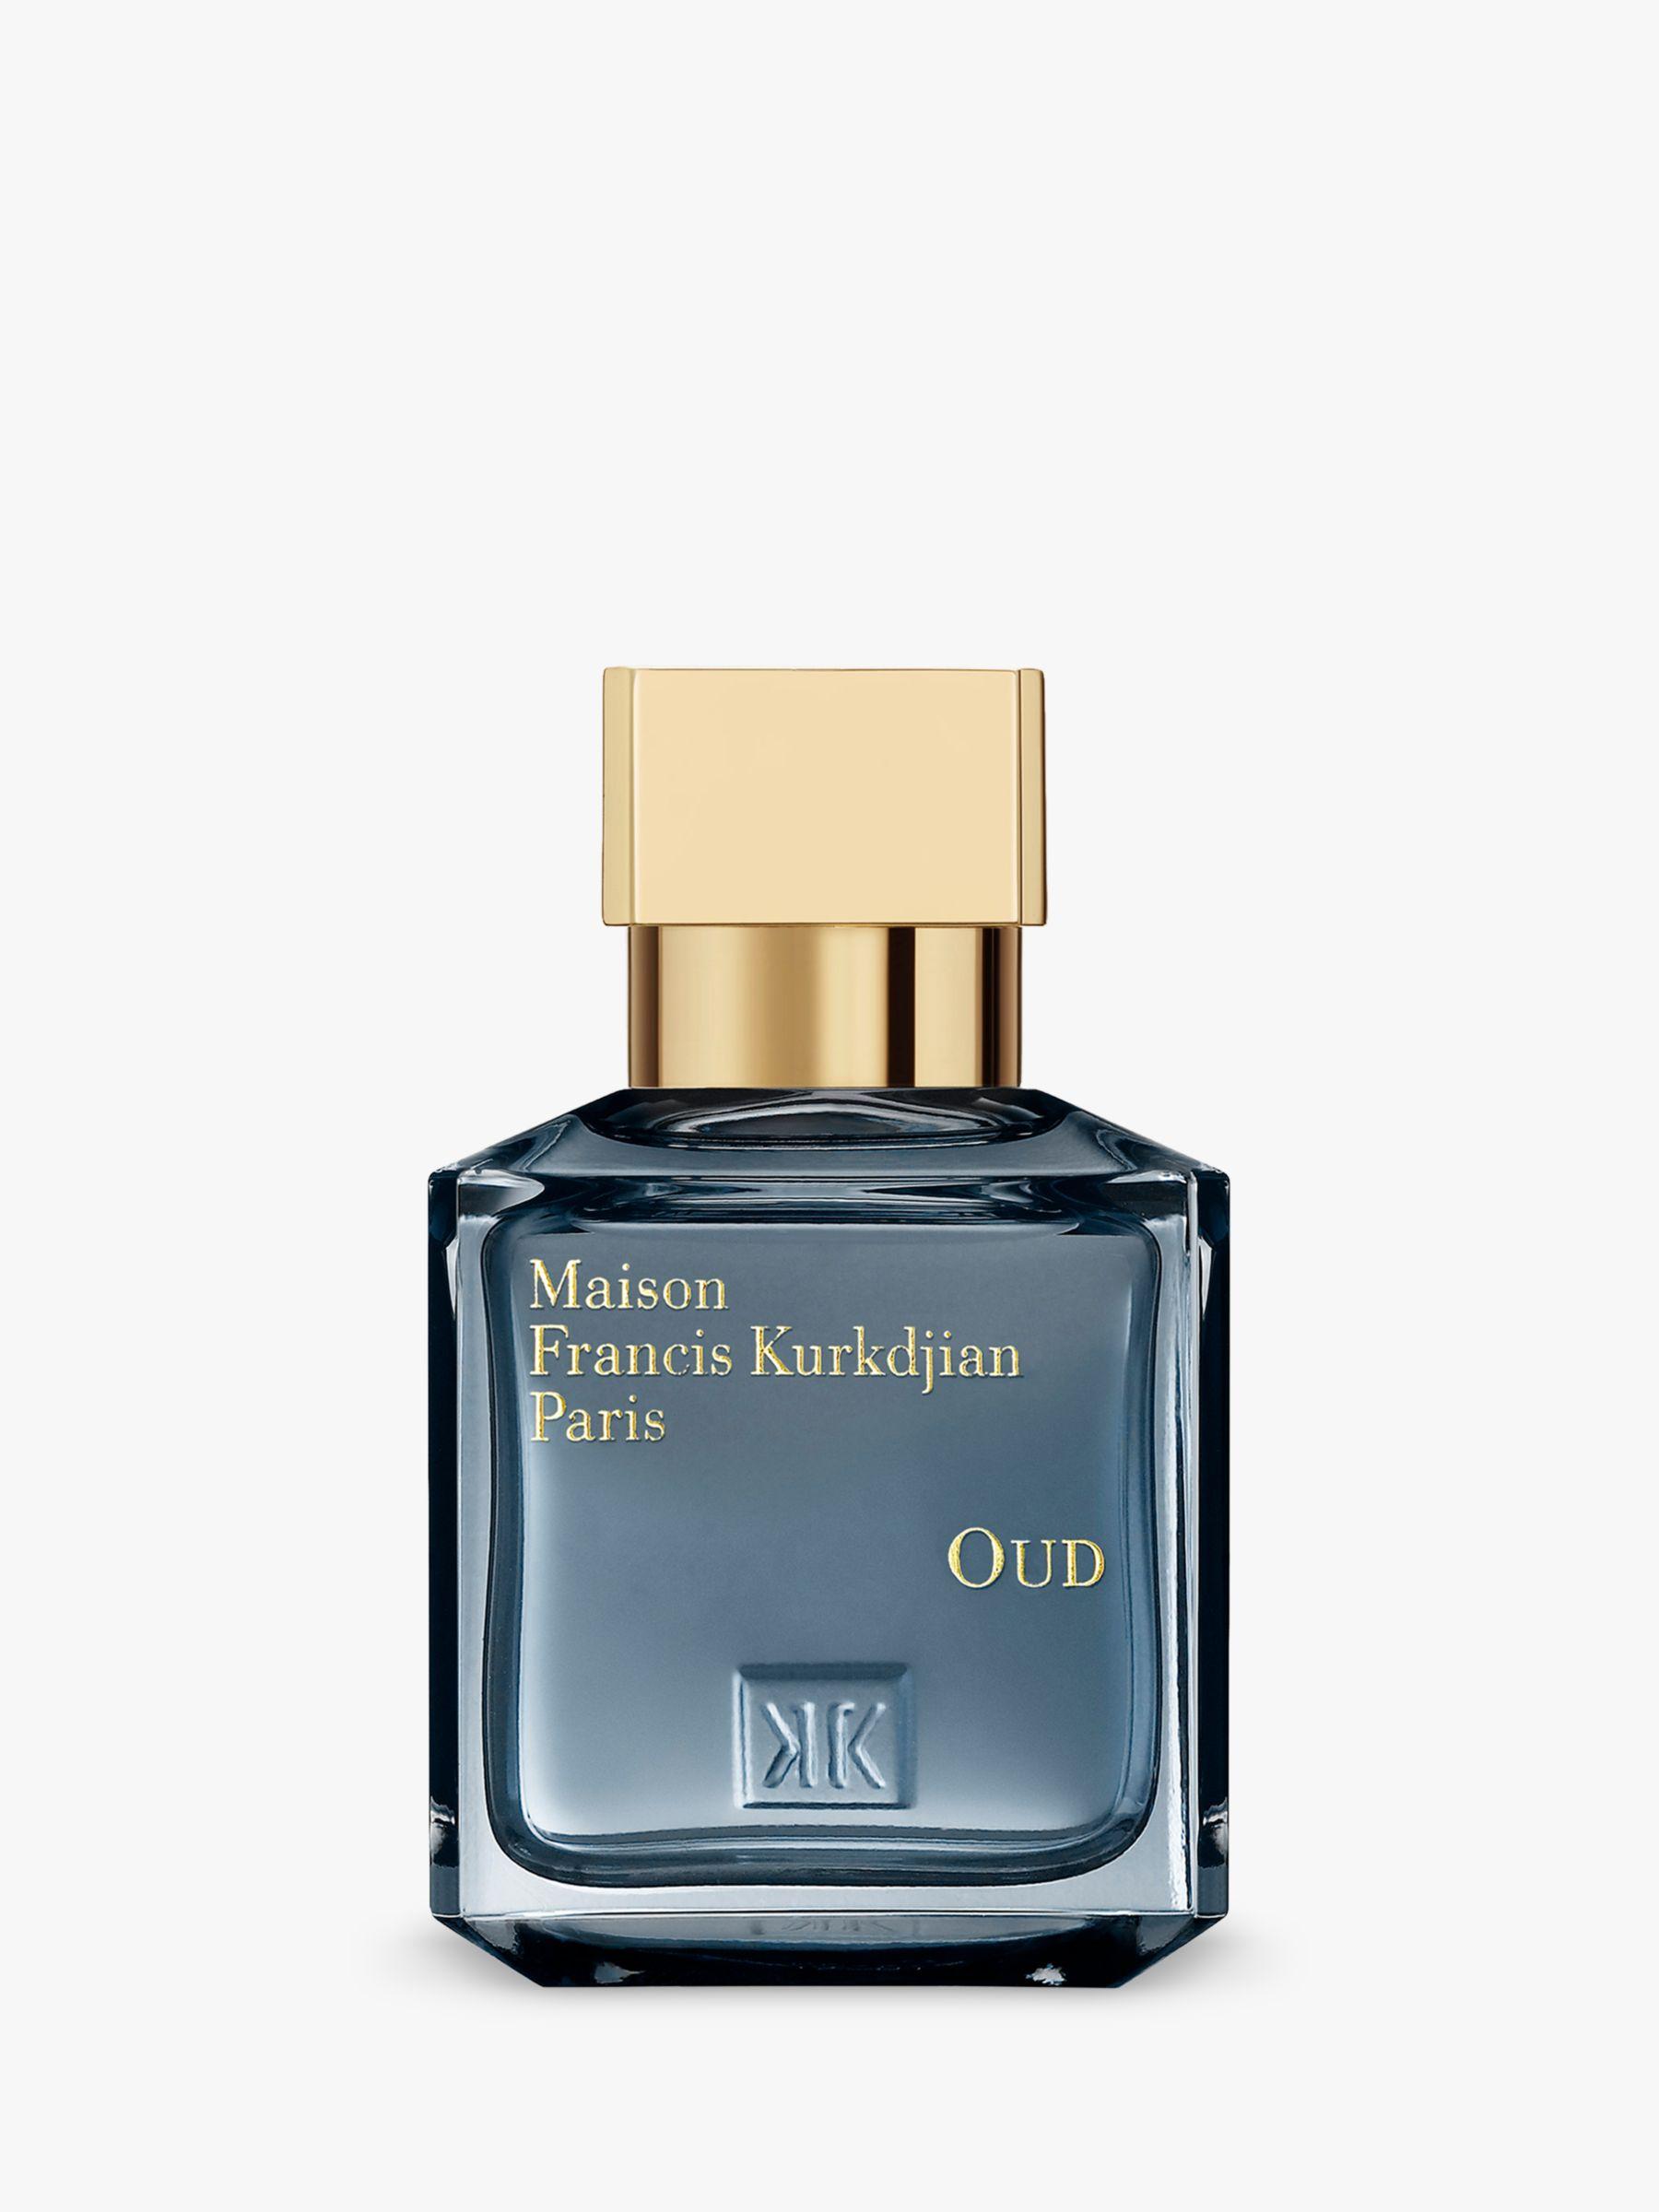 maison francis kurkdjian maison francis kurkdjian oud eau de parfum 70ml shoppingscanner. Black Bedroom Furniture Sets. Home Design Ideas